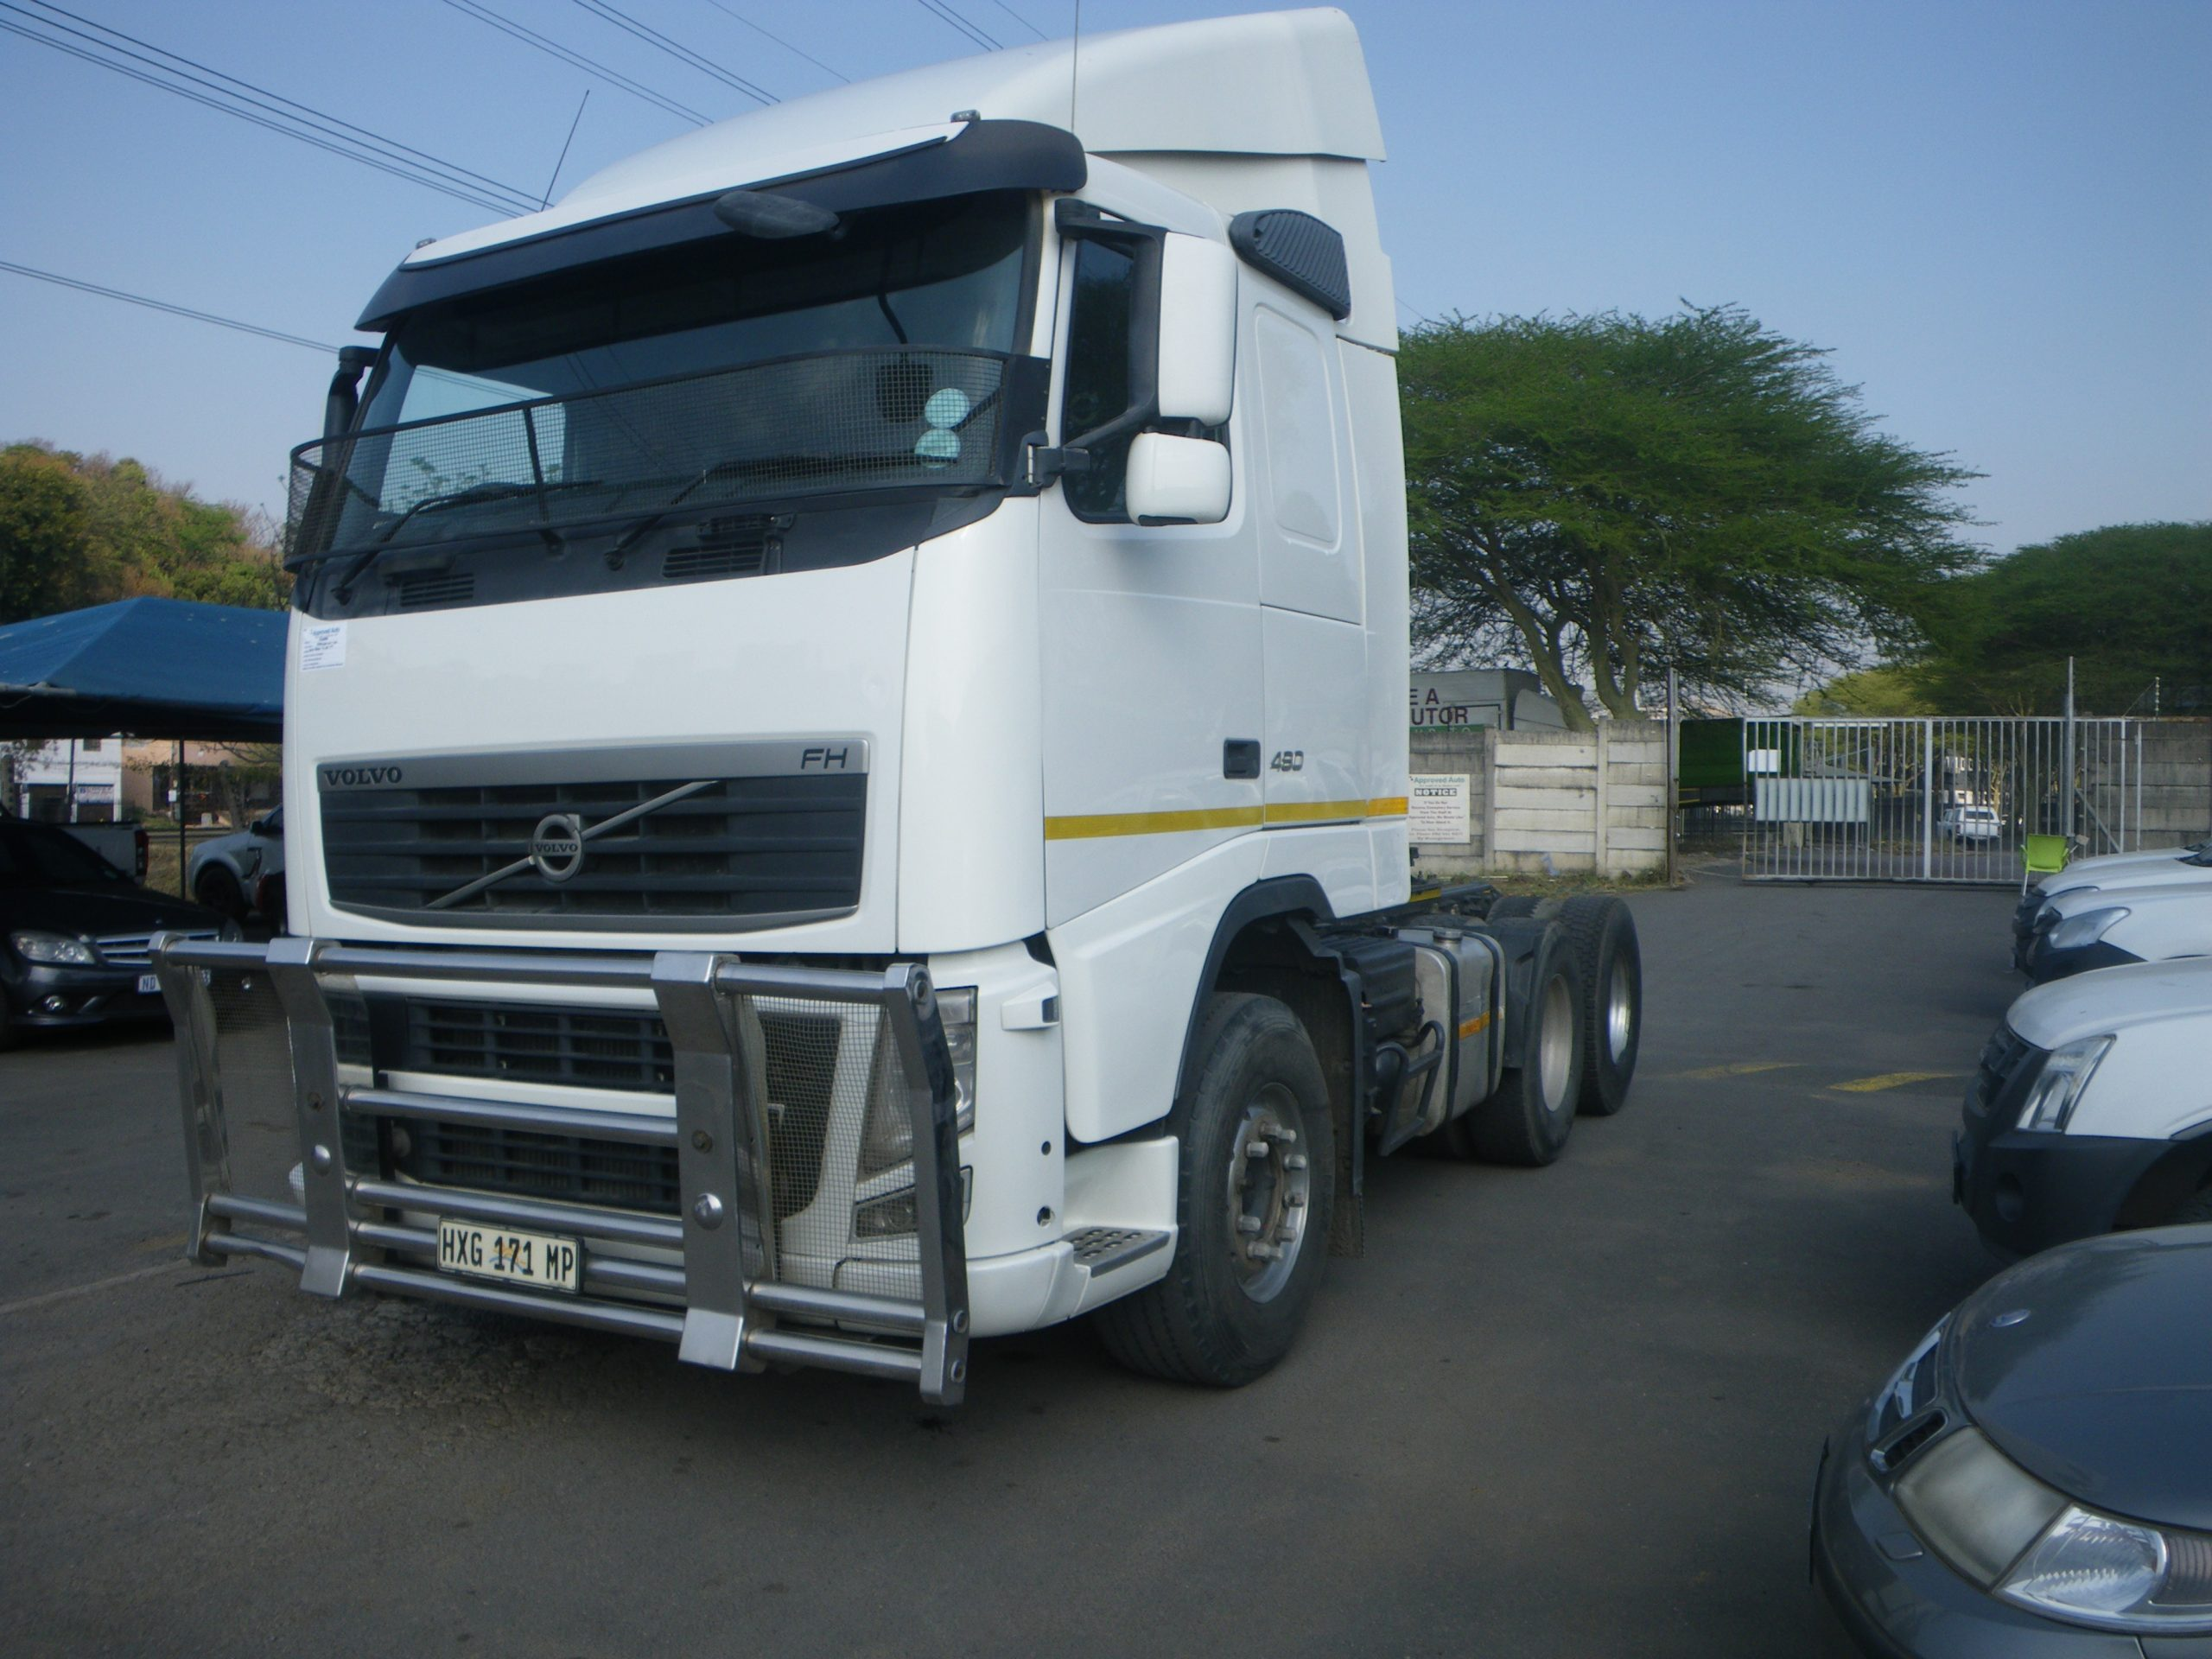 2012-volvo-fh480-truck-tractor-www.n2trucks.co.za